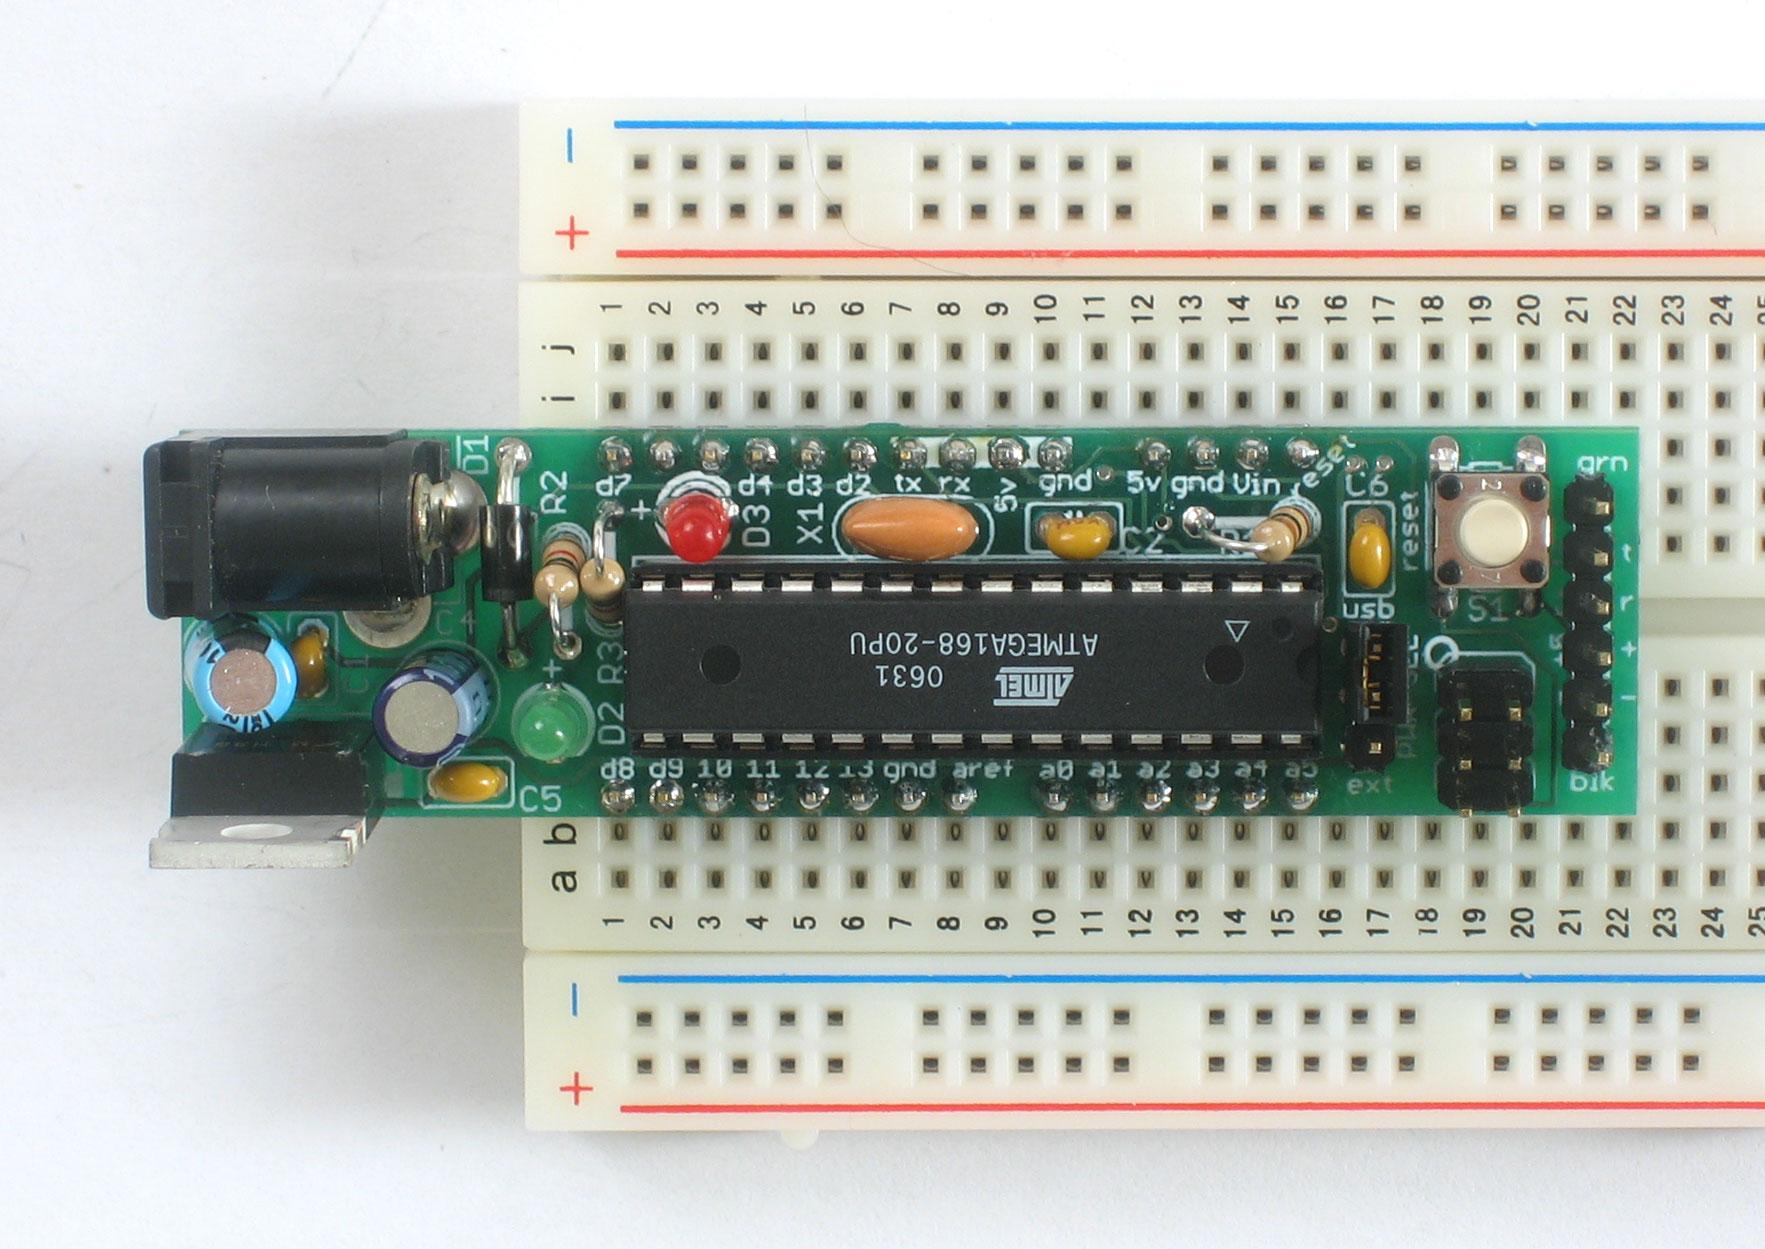 Arduino Embedded Systems 8051 Microcontroller Wikibooks Open Books For An Https Uploadwikimediaorg Wikipedia Commons 8 8d Boarduino